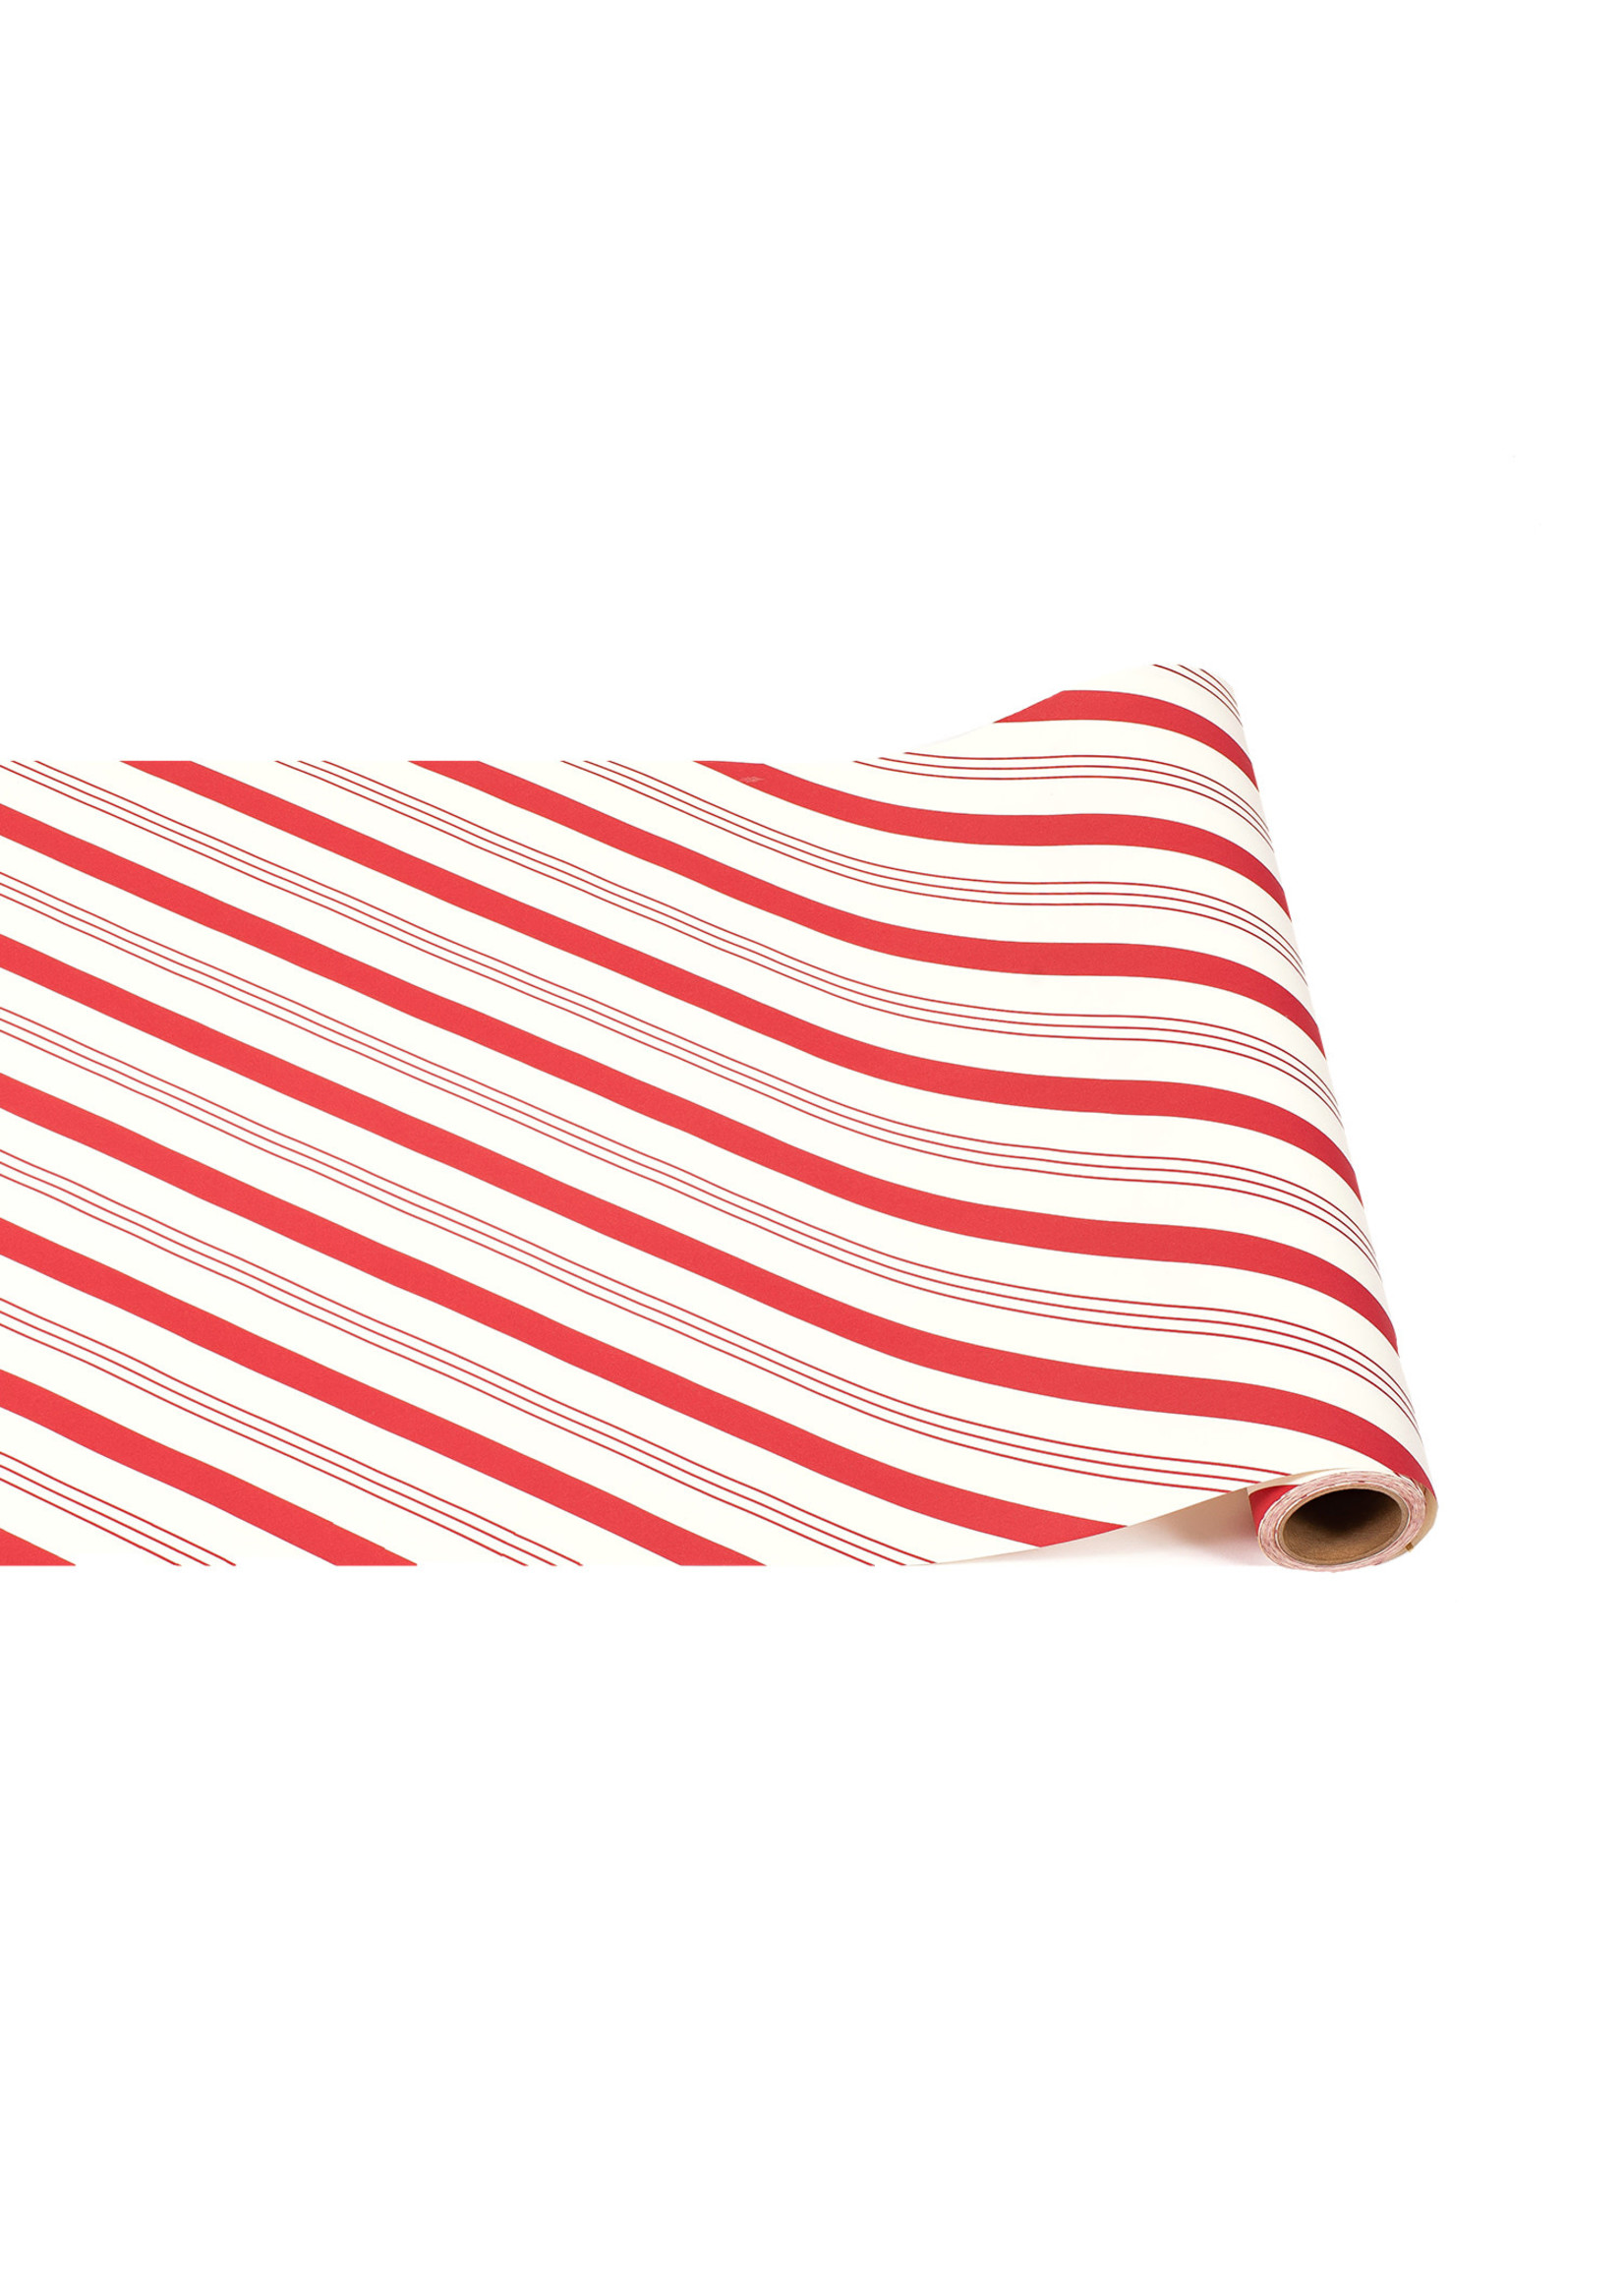 Hester & Cook Paper Runner - Candy Stripe